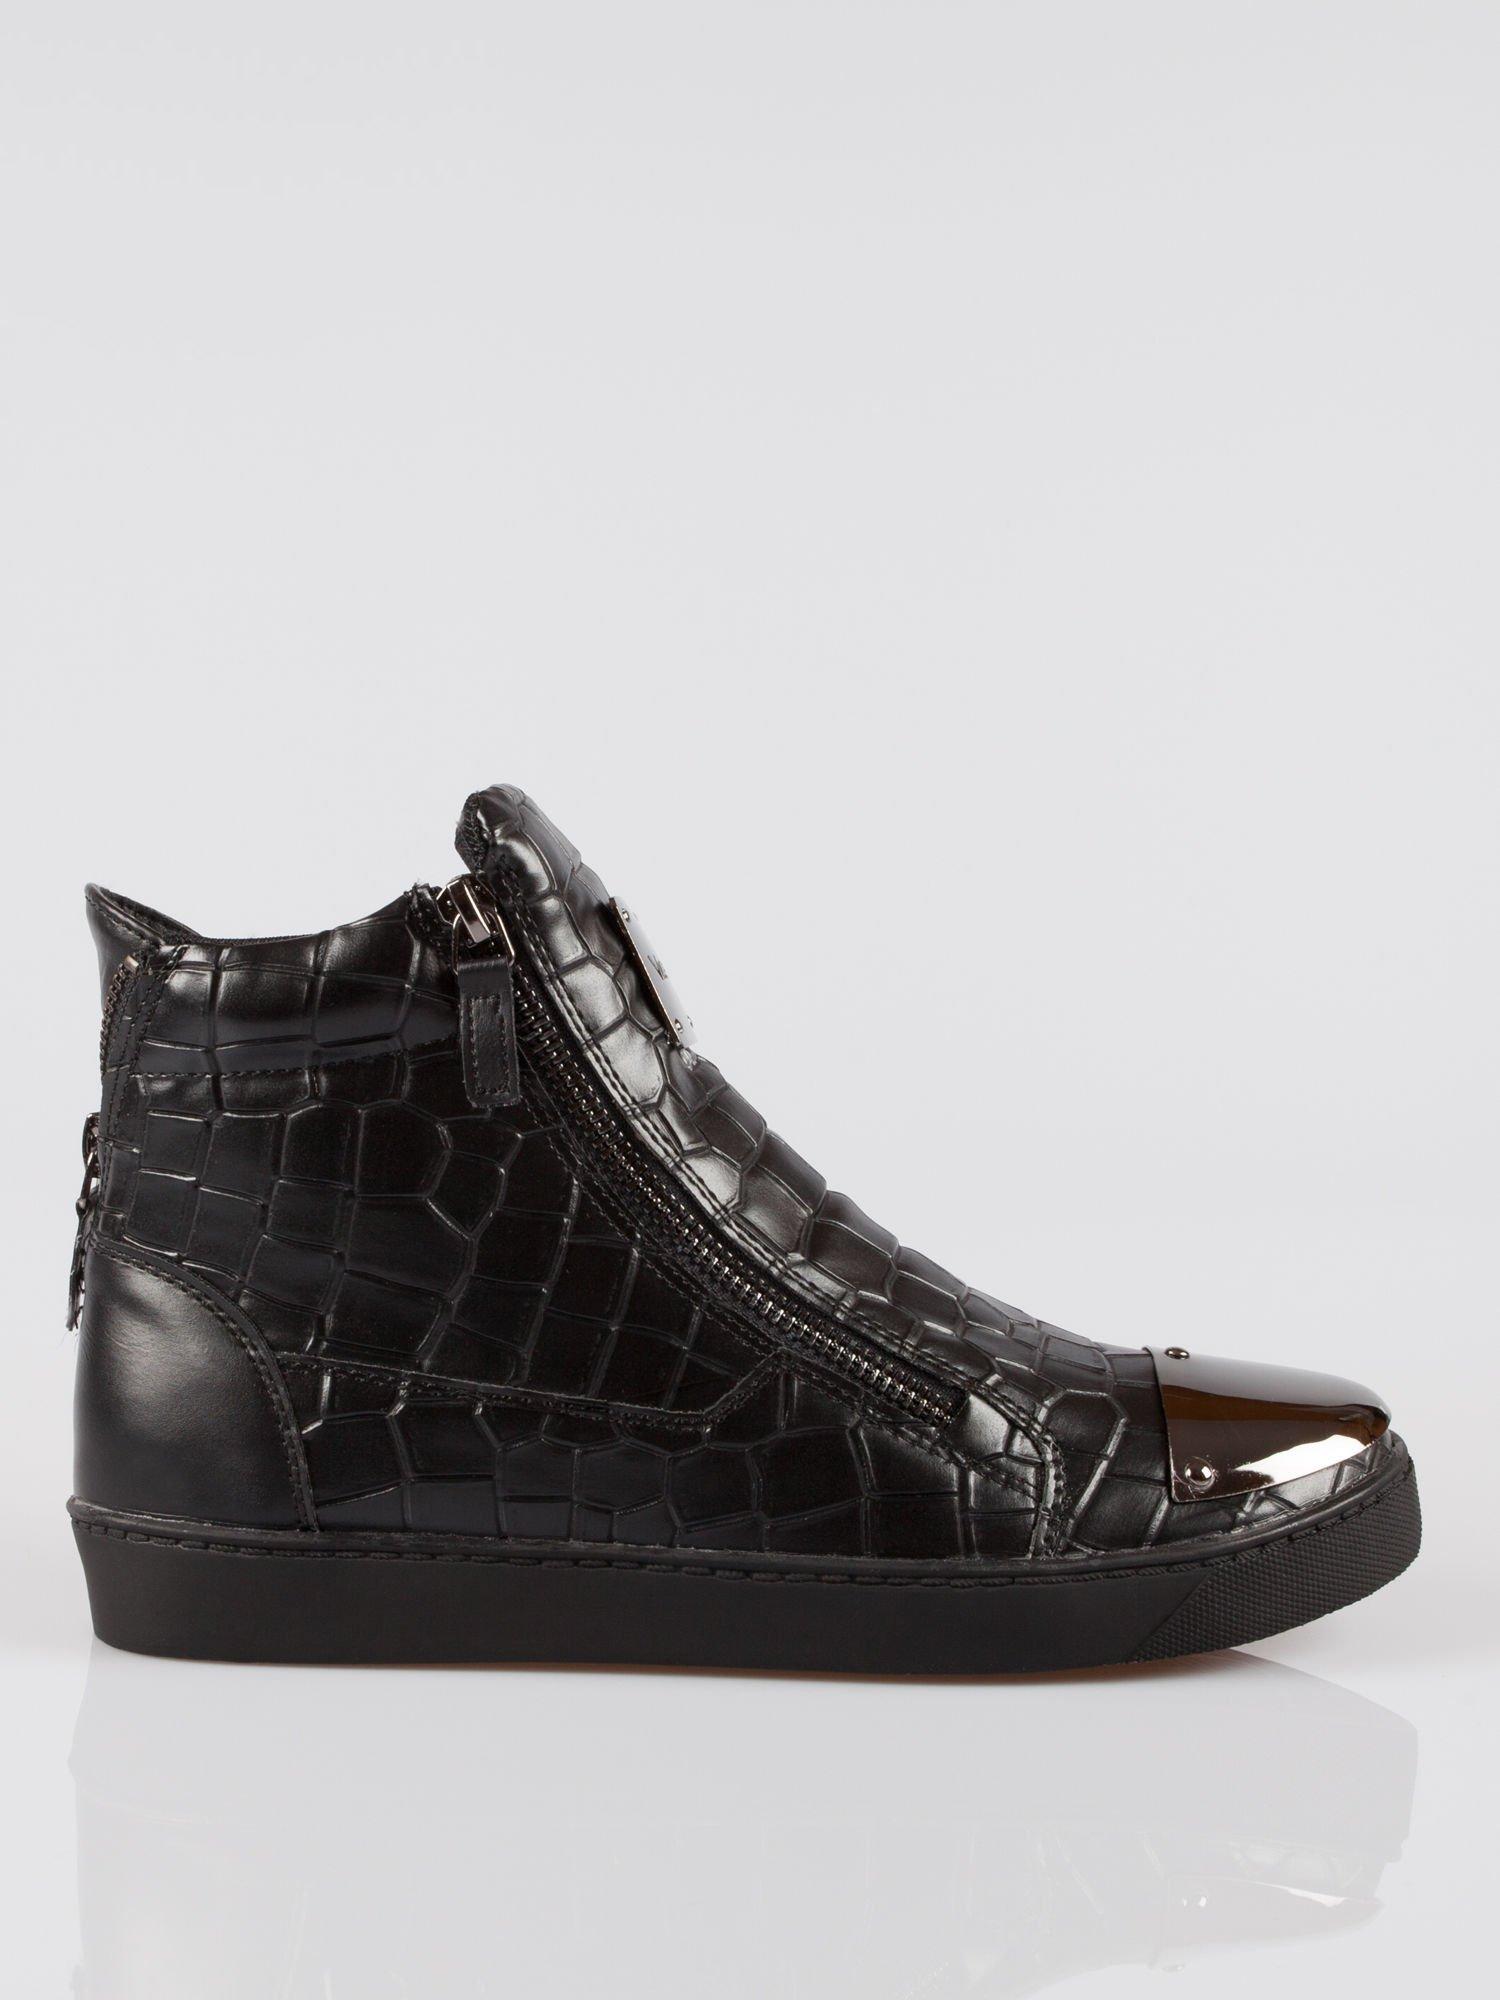 Czarne sneakersy Vanessa tłoczone na wzór skóry krokodyla                                  zdj.                                  1